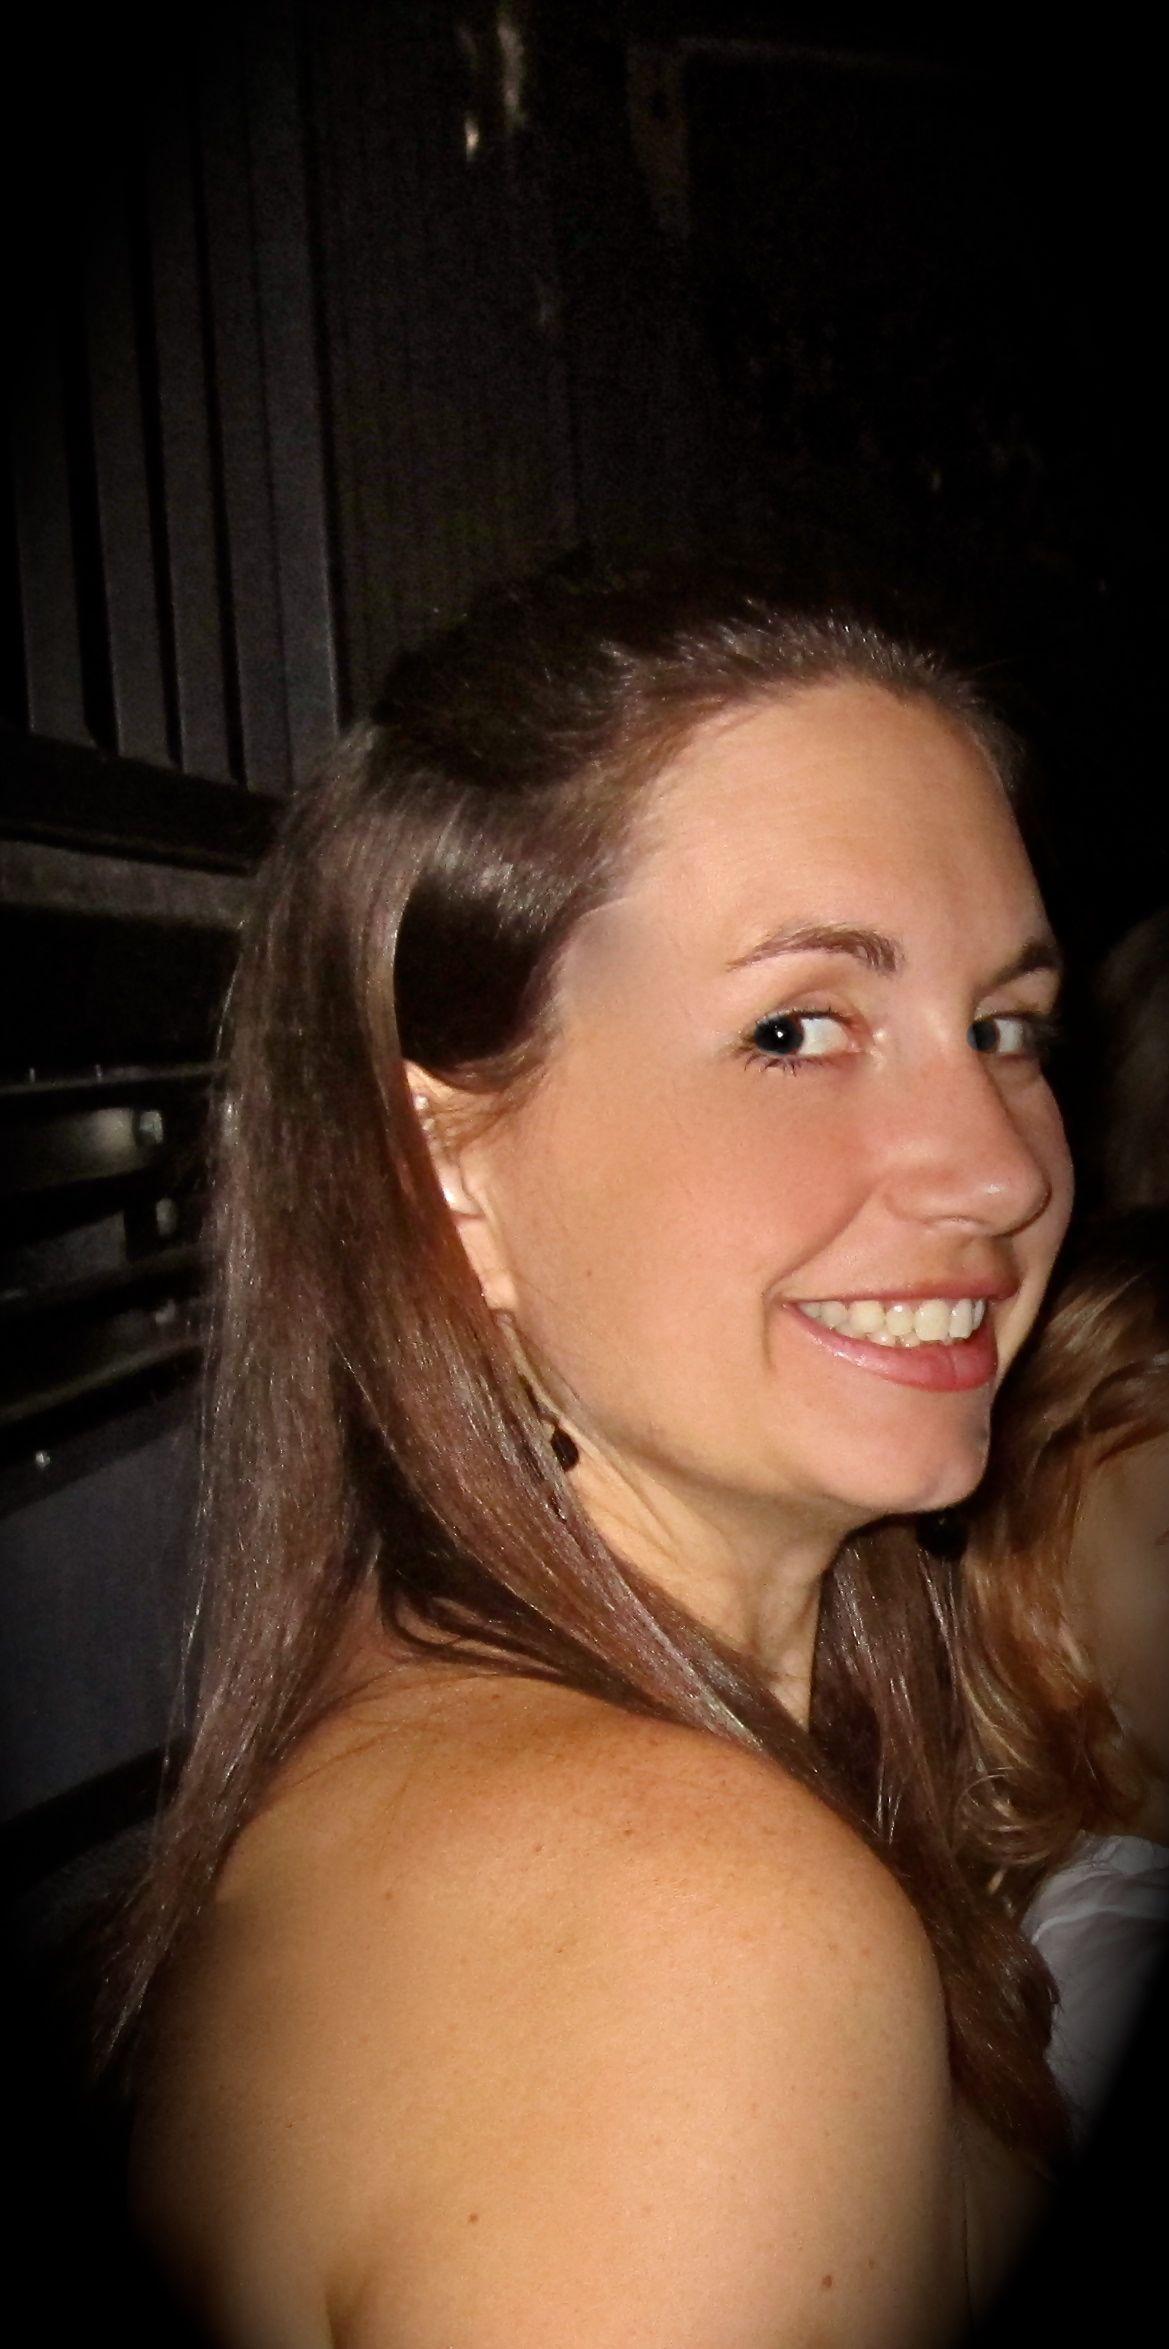 Author, Kb Lever